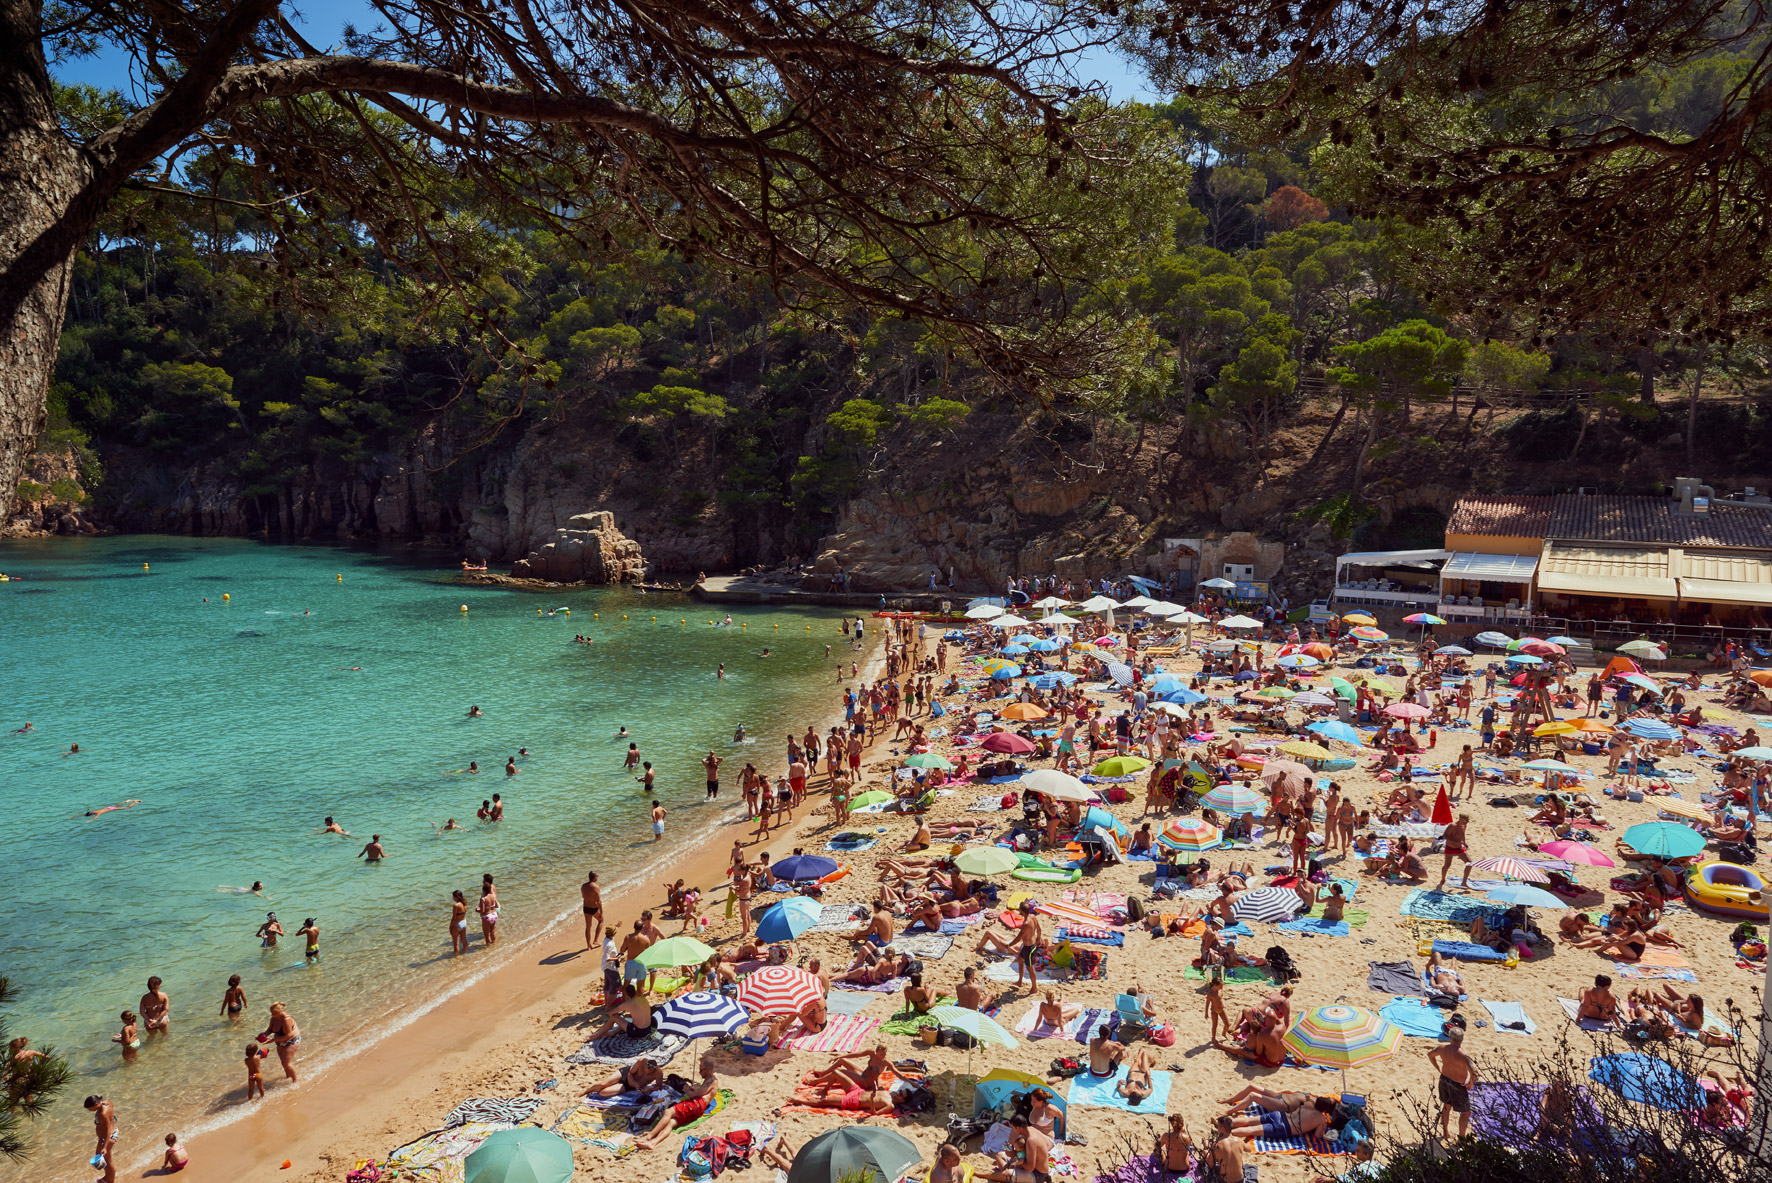 20150830_Travel_Spain-7-beach-2.jpg